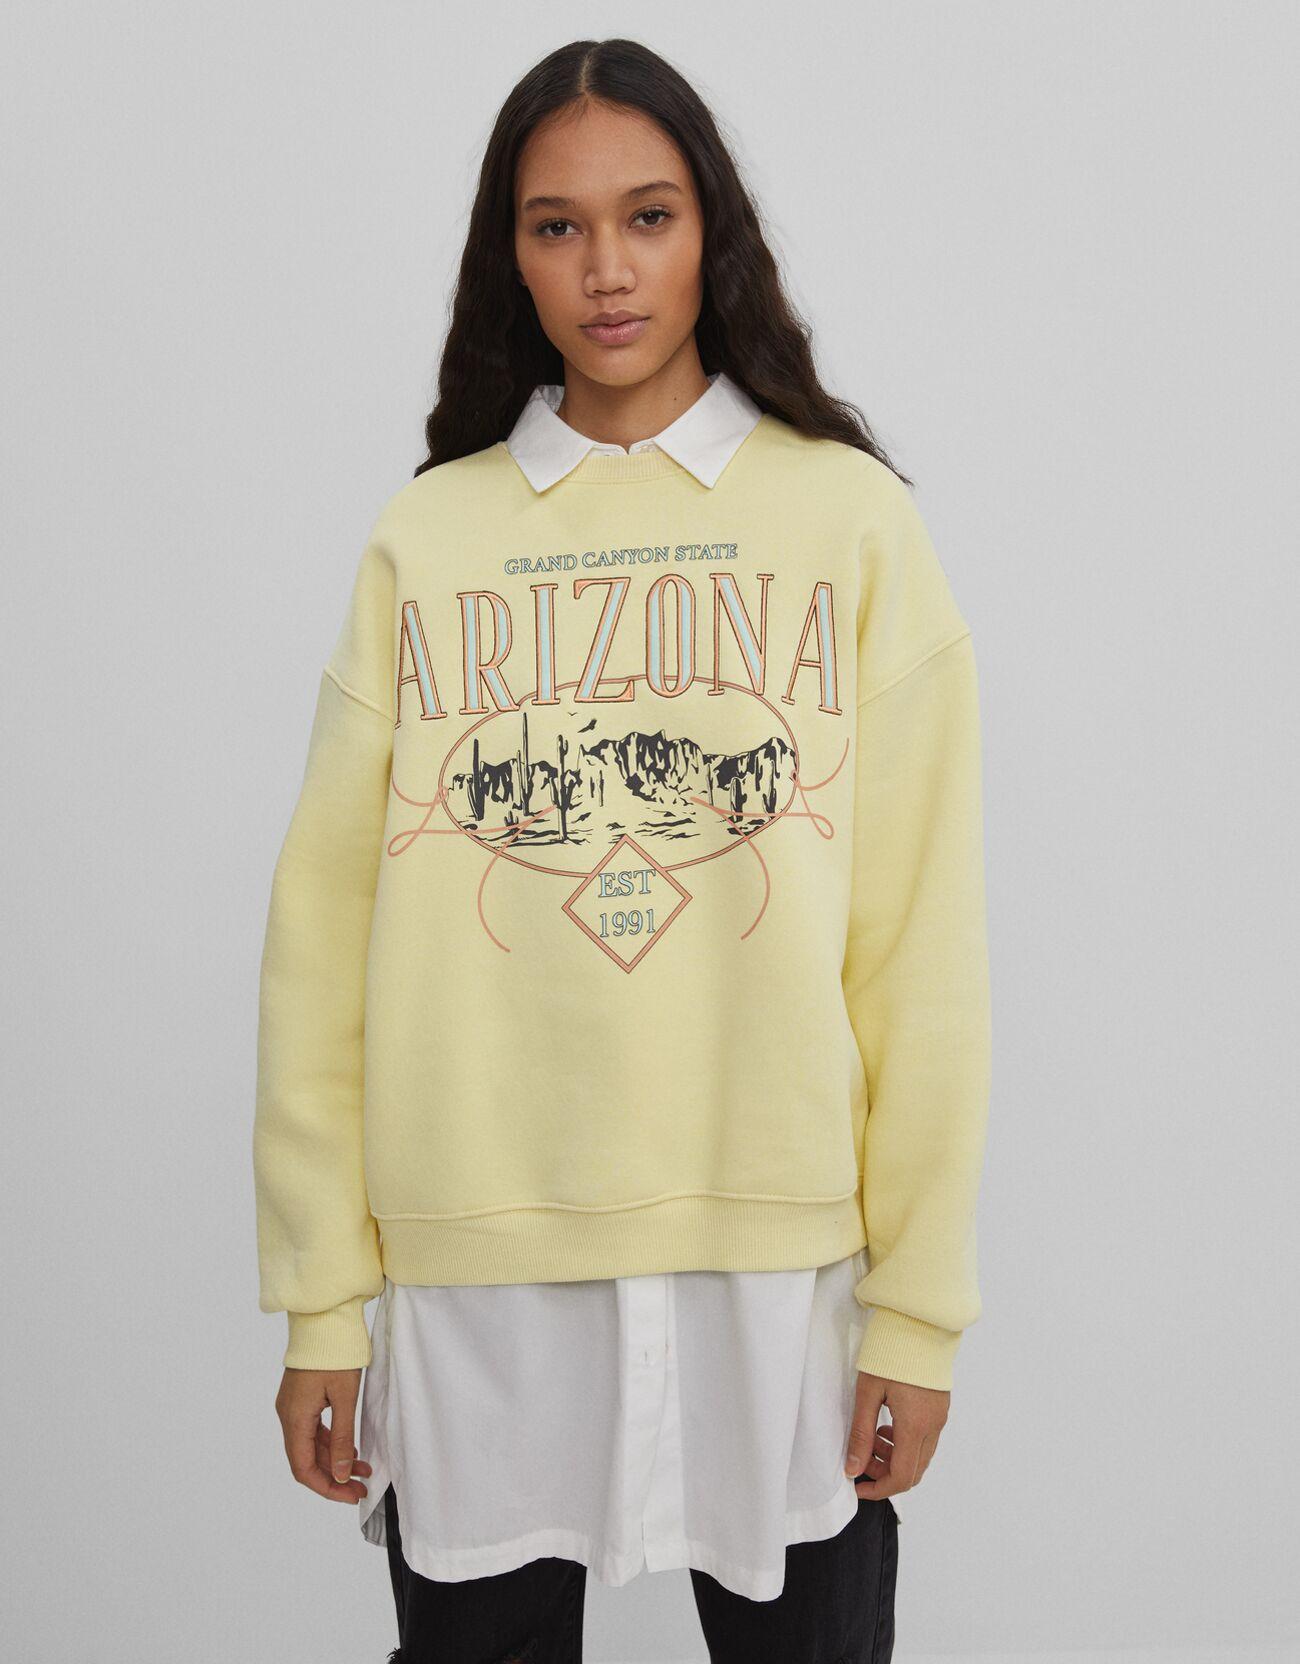 Arizona XL Sweatshirt